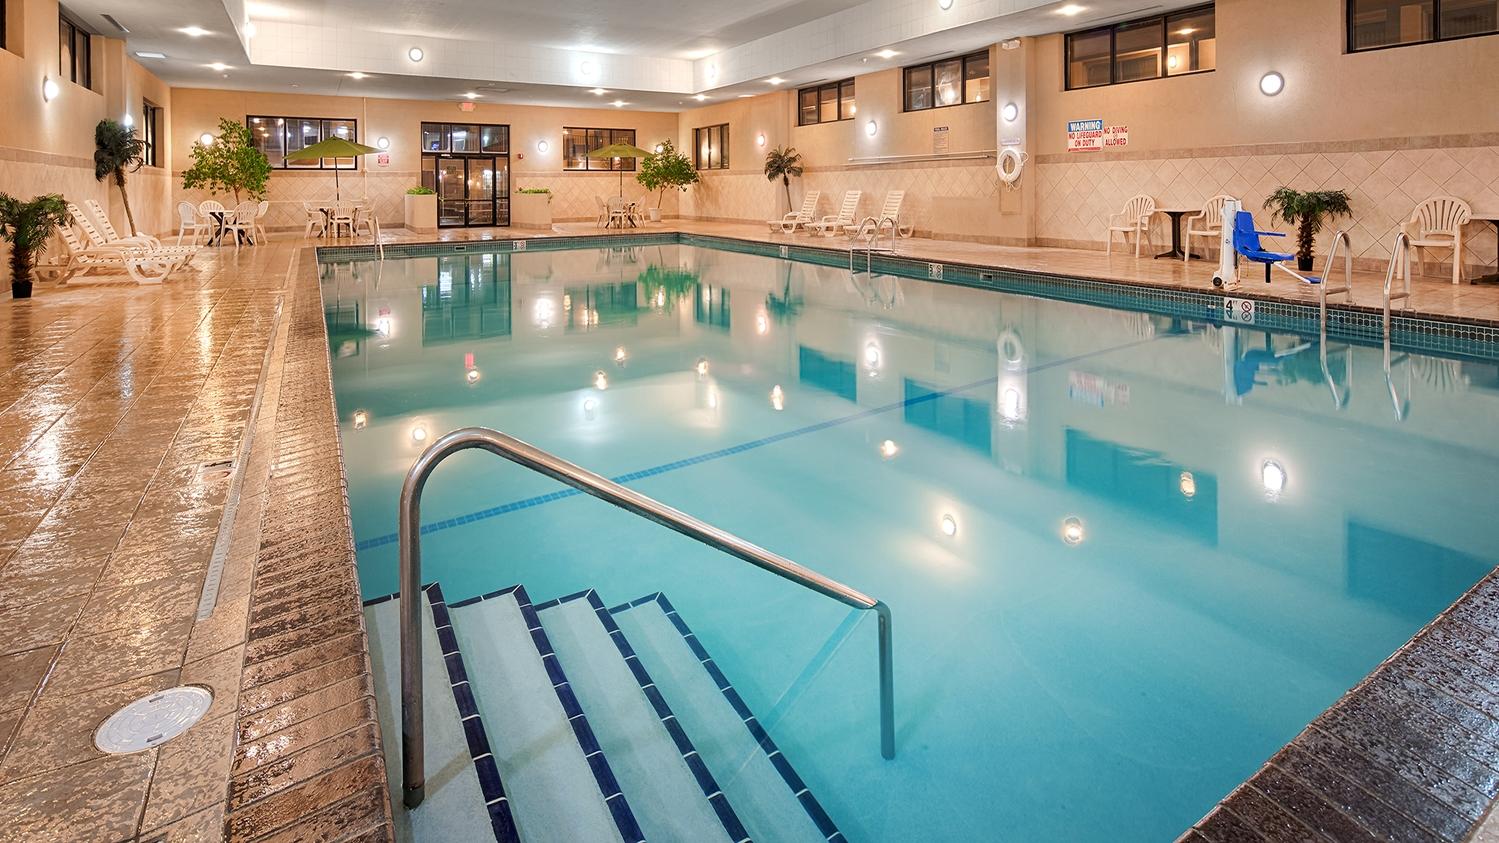 Pool - Best Western Ramkota Inn Rapid City